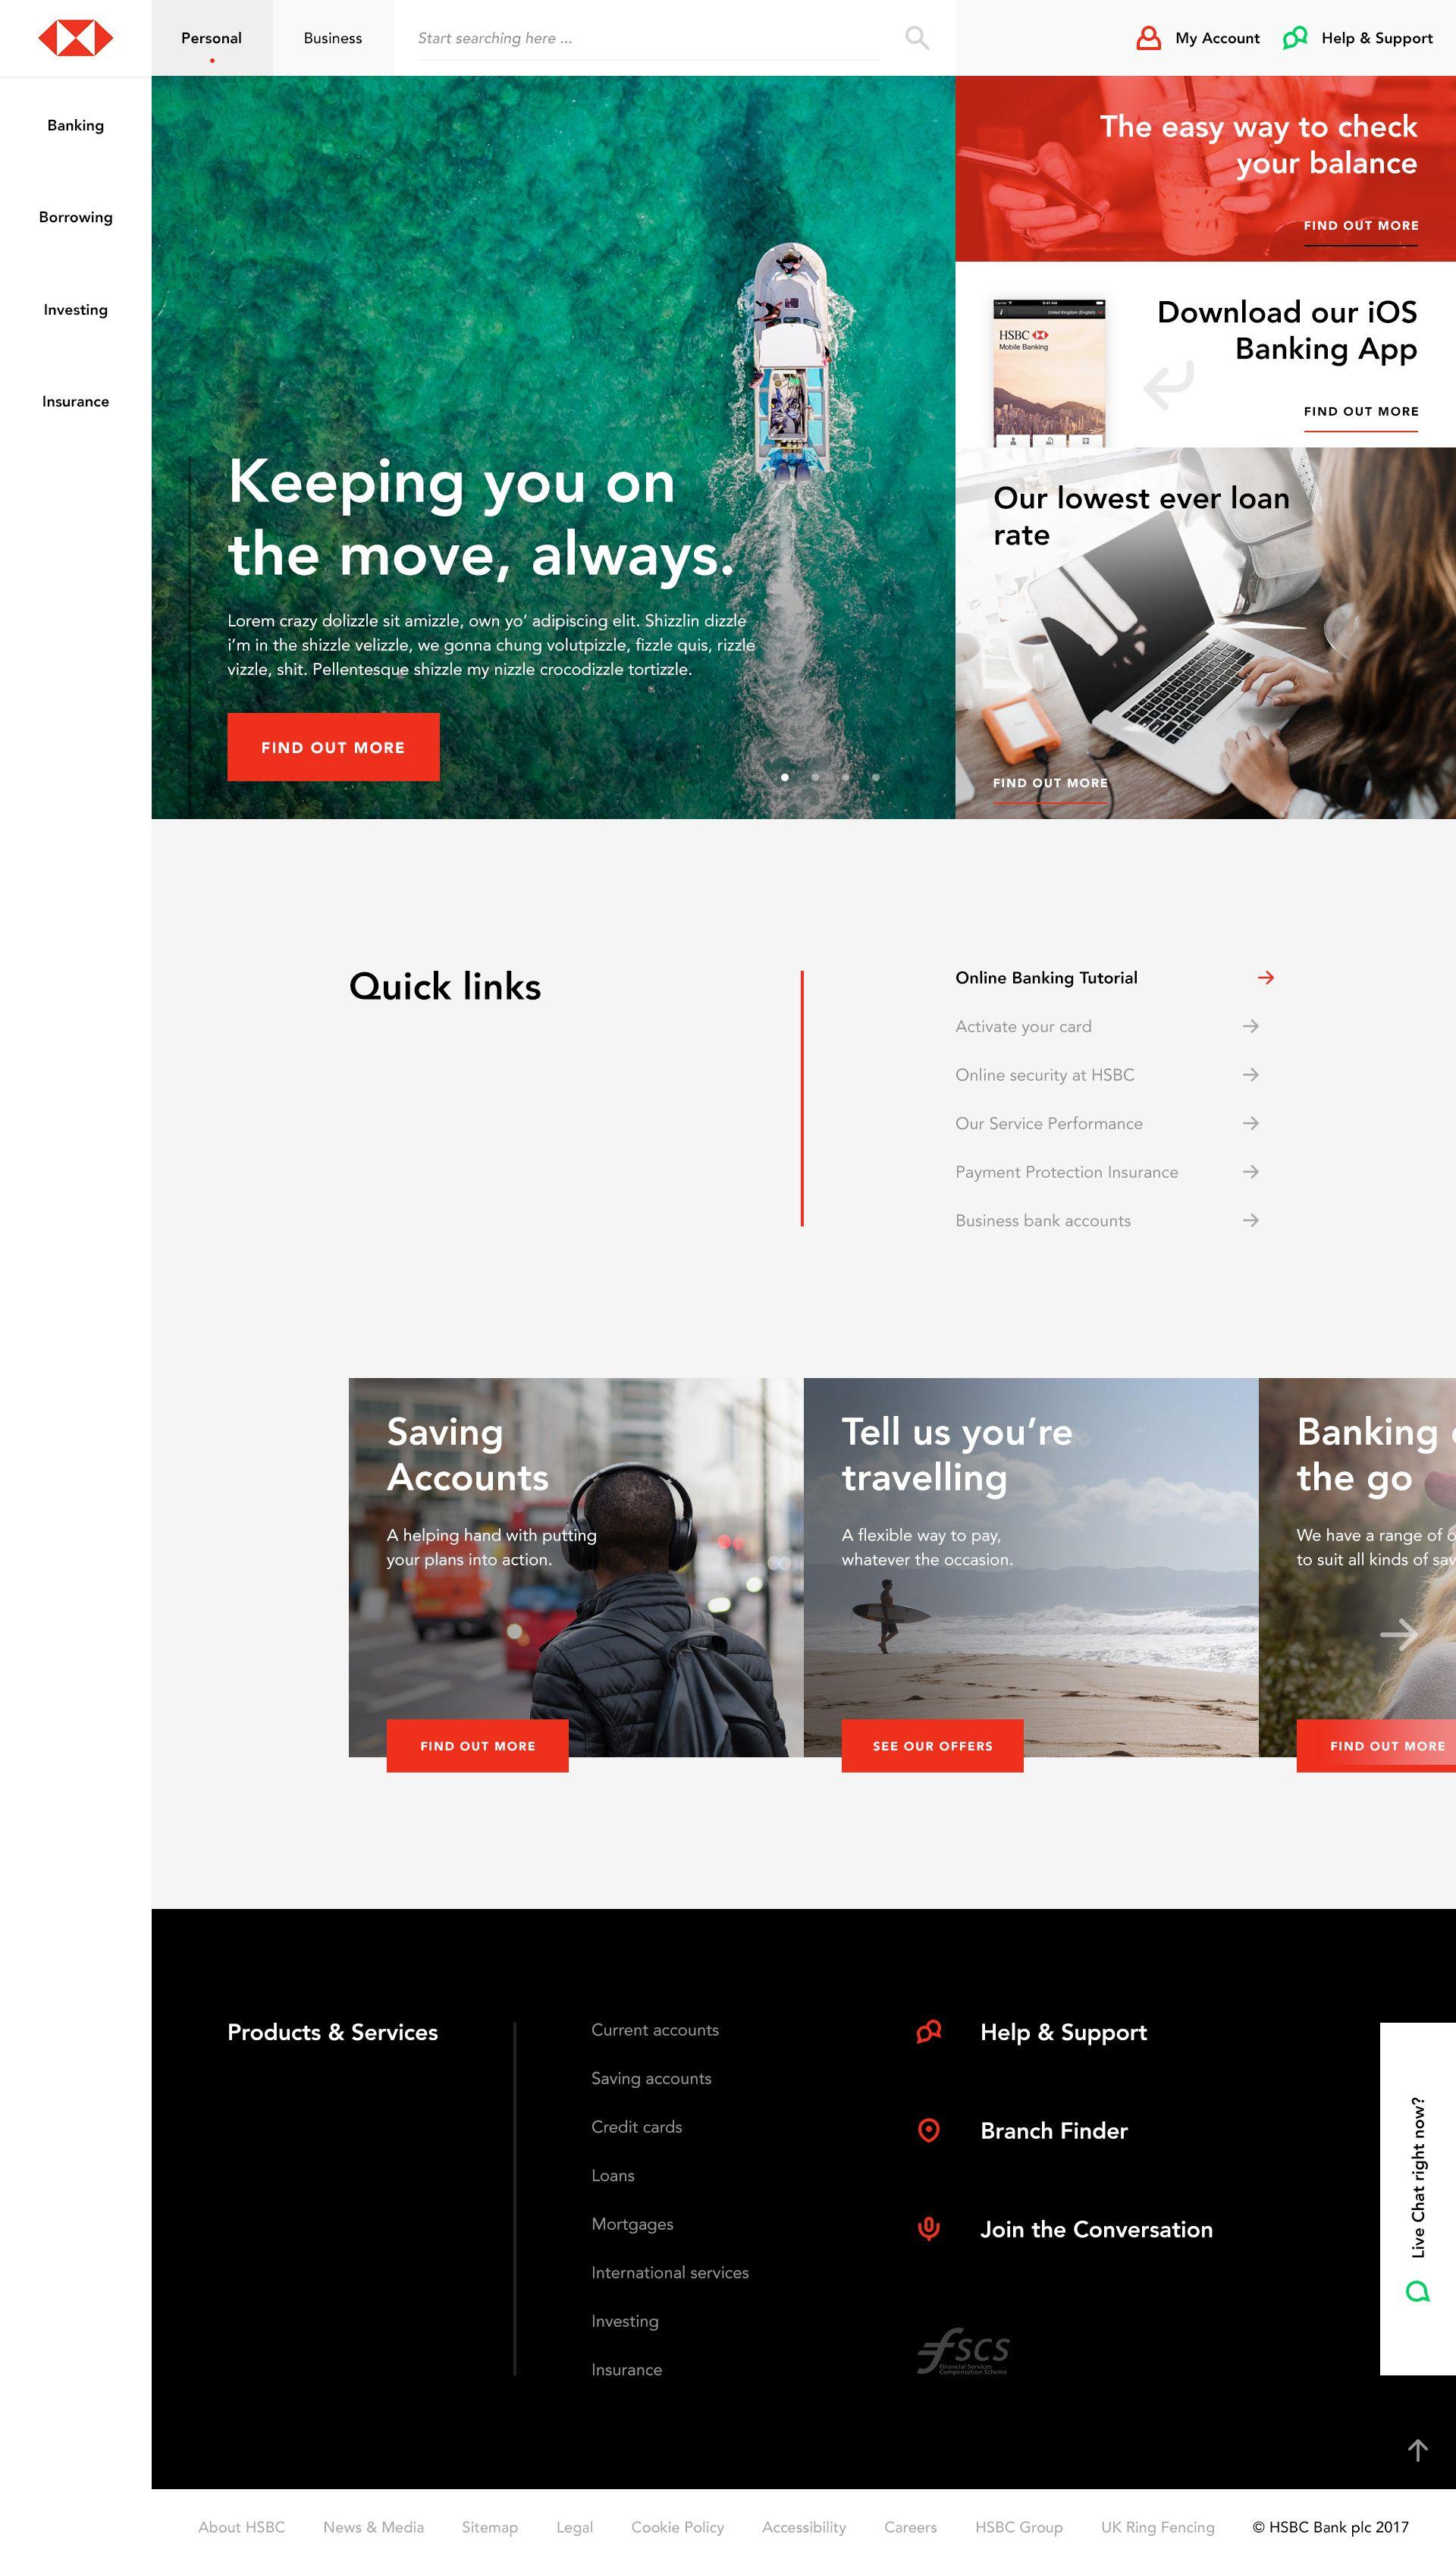 HSBC (Concept) – MRKODNGHE | 2017 new | Web design, Design, Business